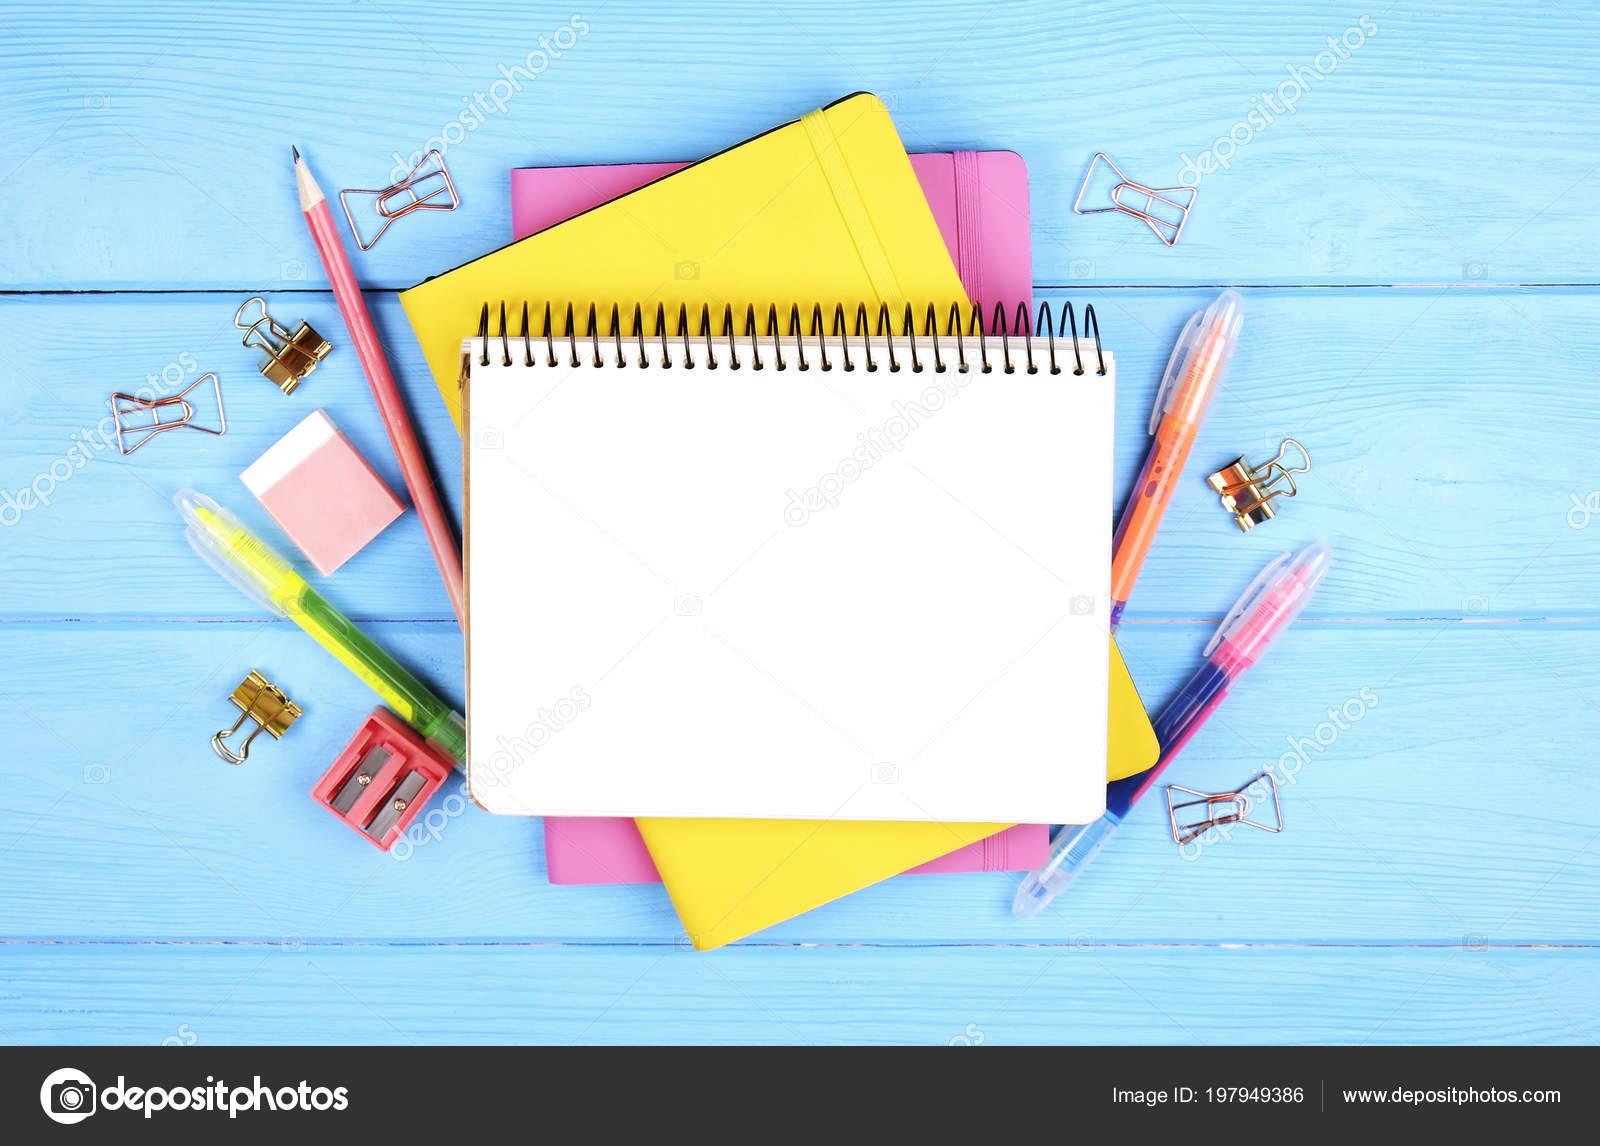 2a9220361d Θηλυκό Σετ Σχολικά Είδη Κίτρινο Ροζ Κάλυμμα Κενό Φύλλο Ανοίξτε– εικόνα  αρχείου